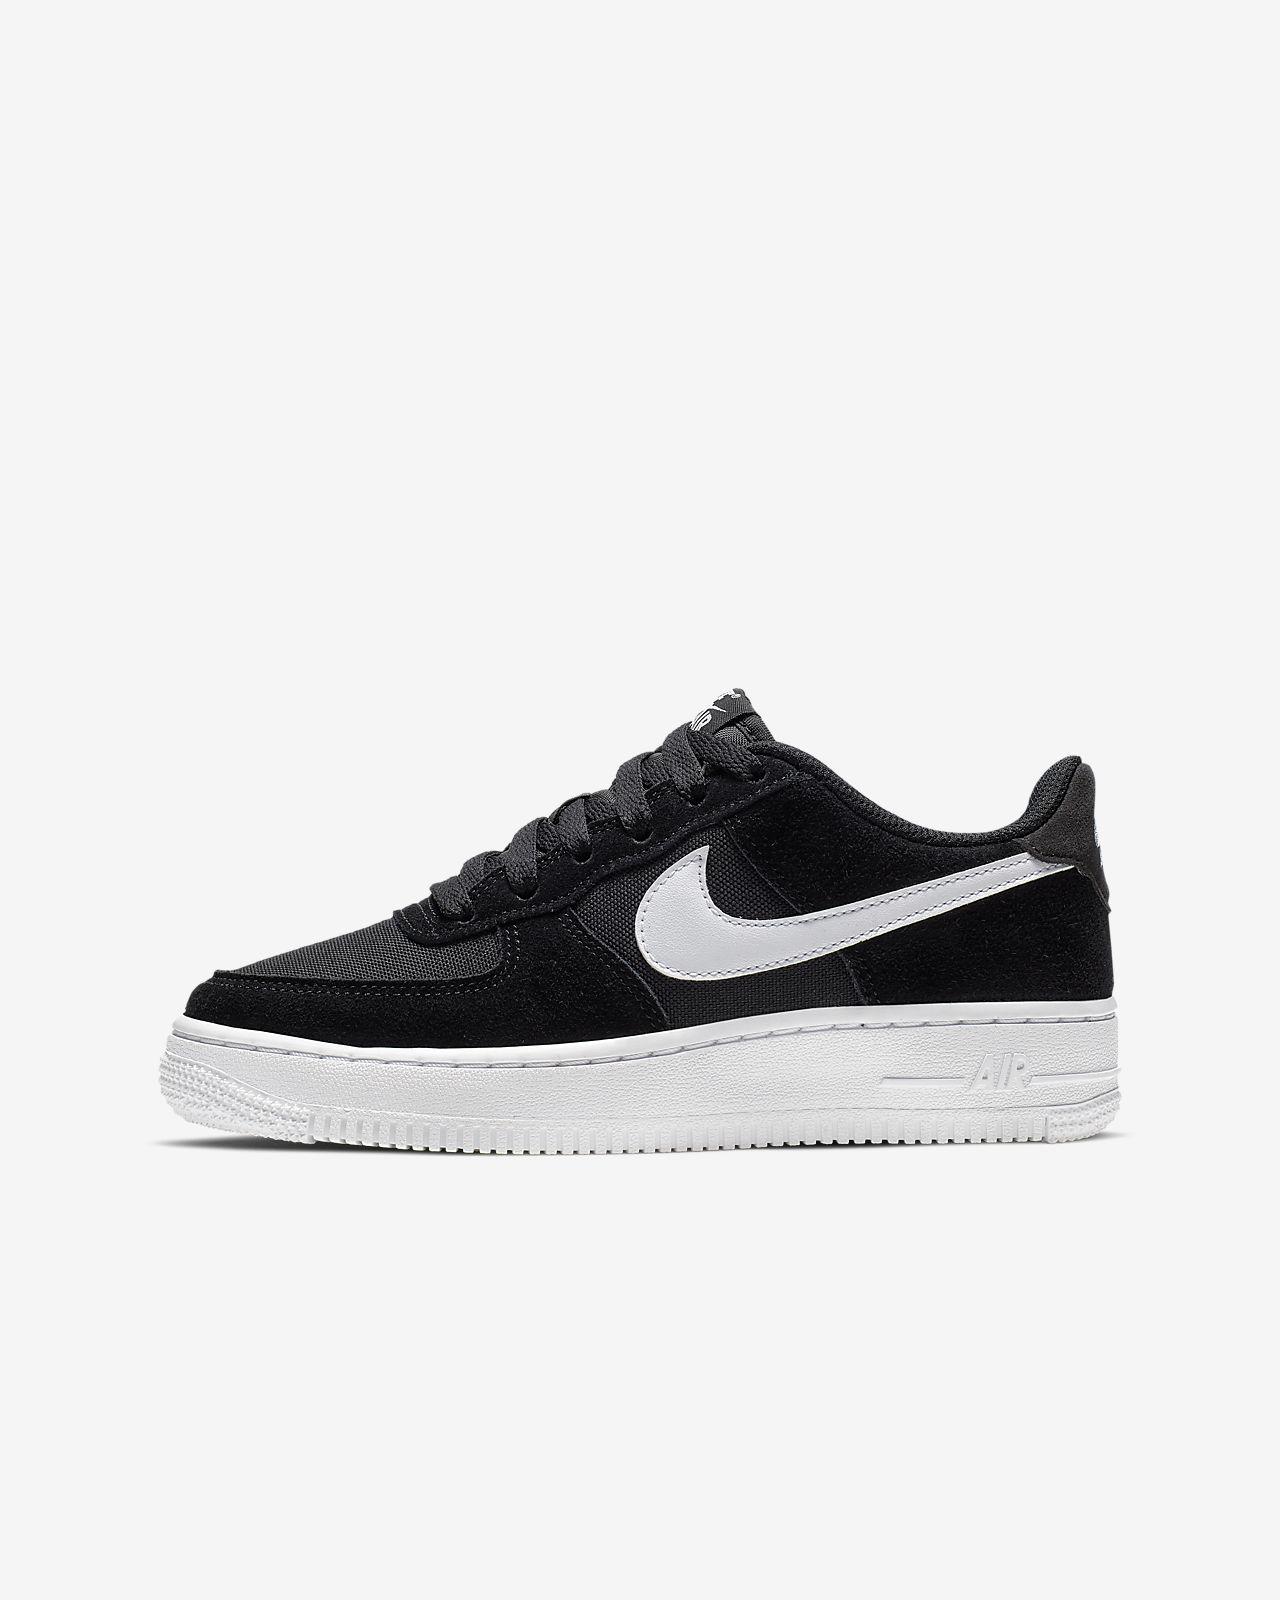 Nike Air Force 1 PE Older Kids' Shoe